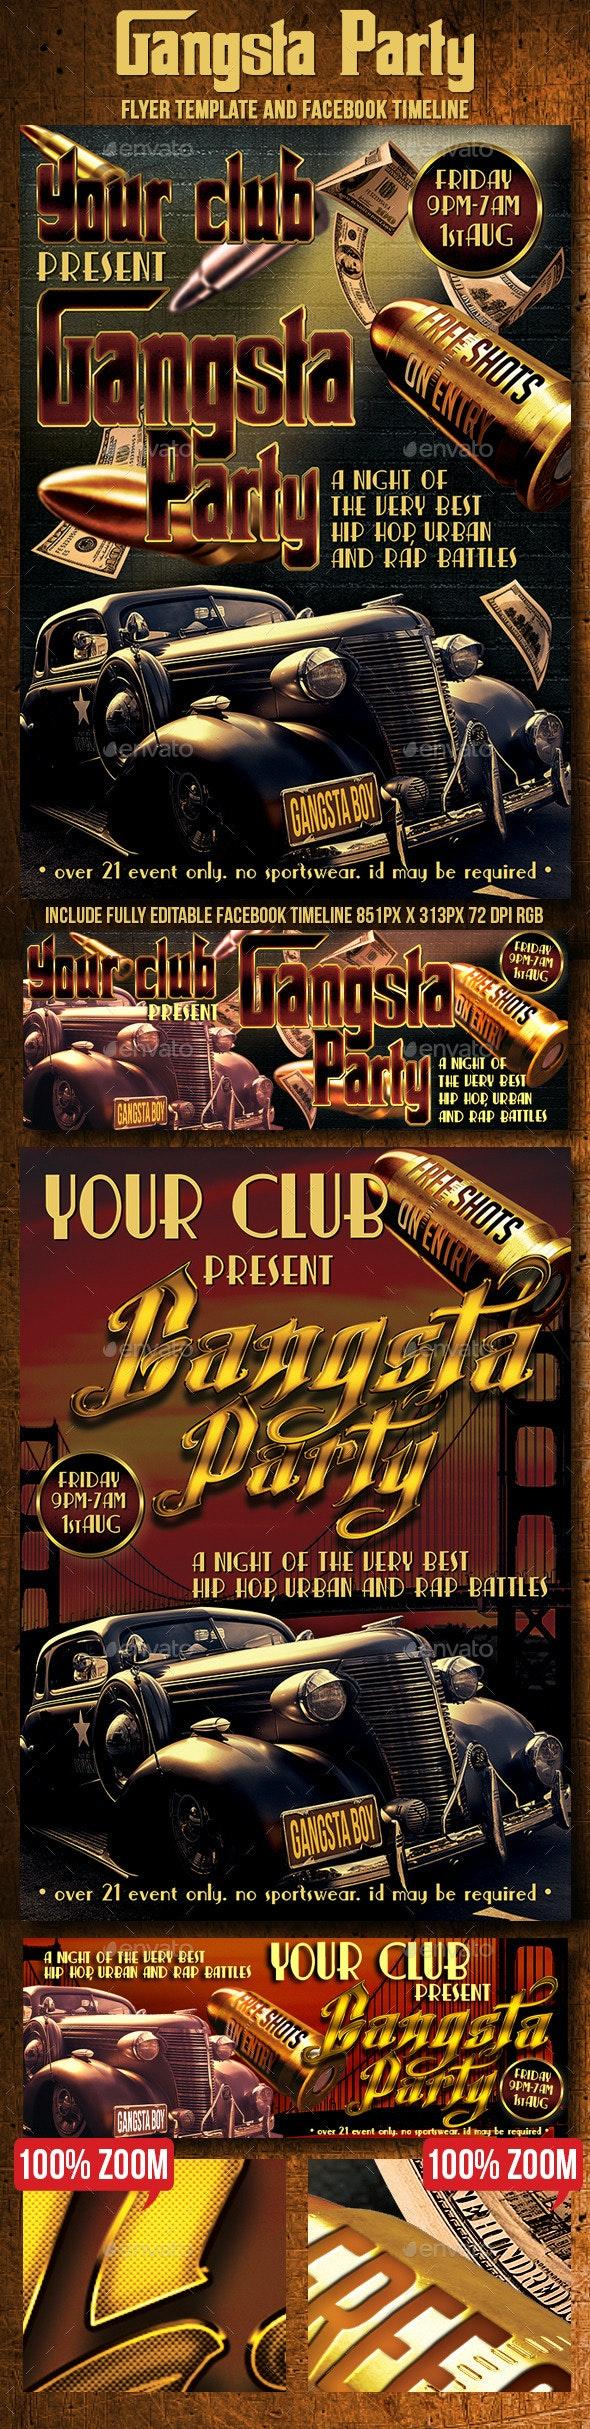 Gangsta Party Flyer, Ticket & Facebook Timeline - Events Flyers